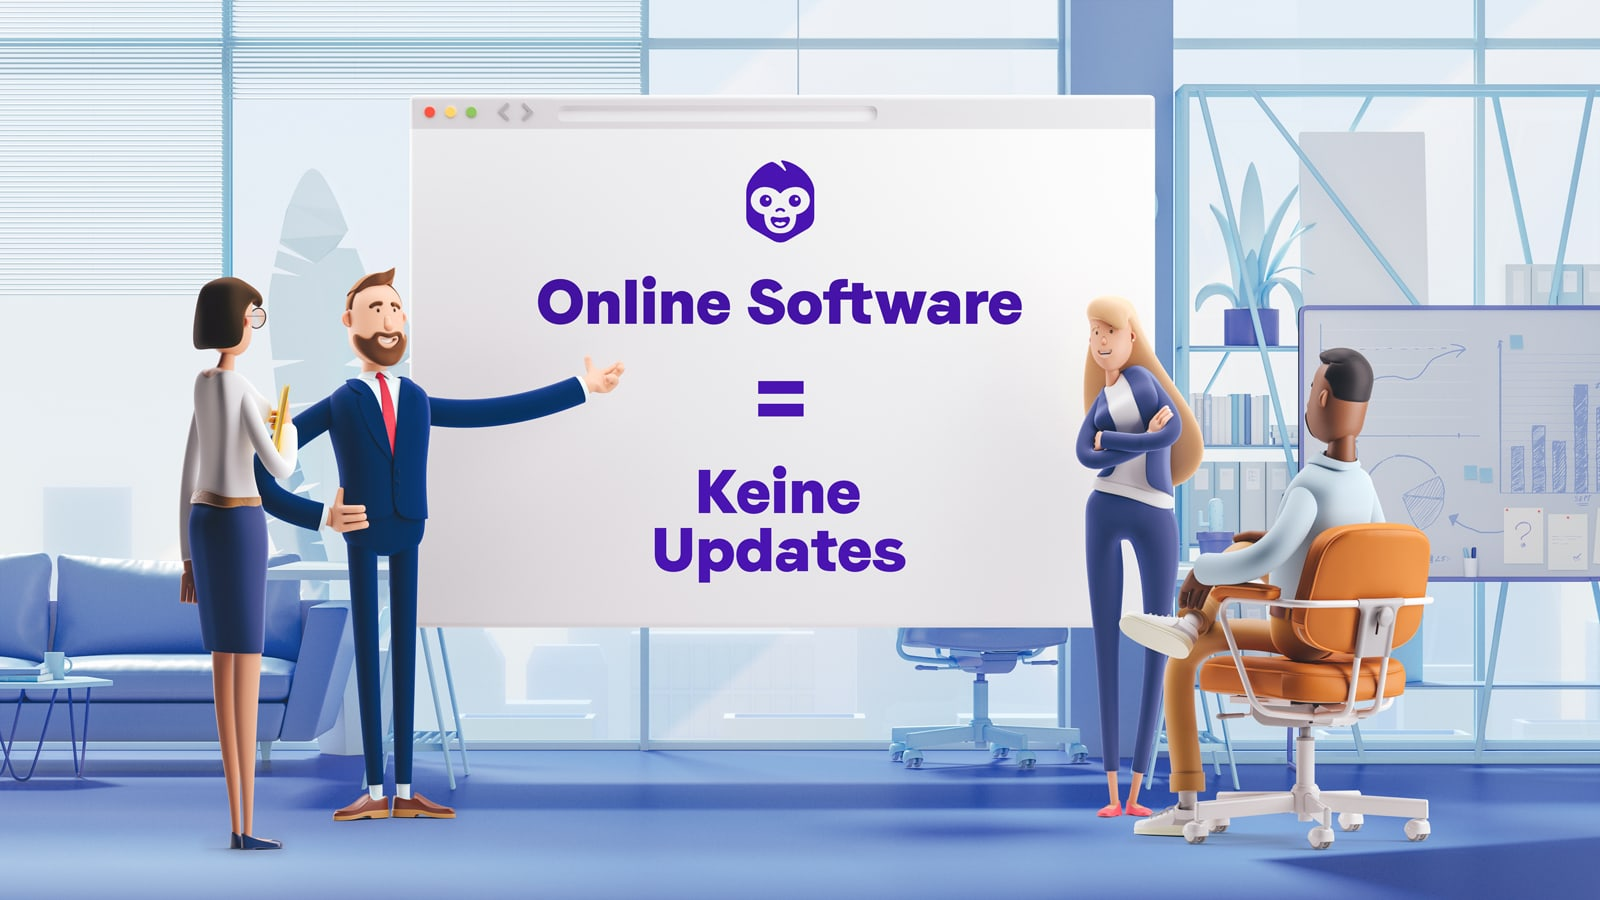 2. Web-basierte Software